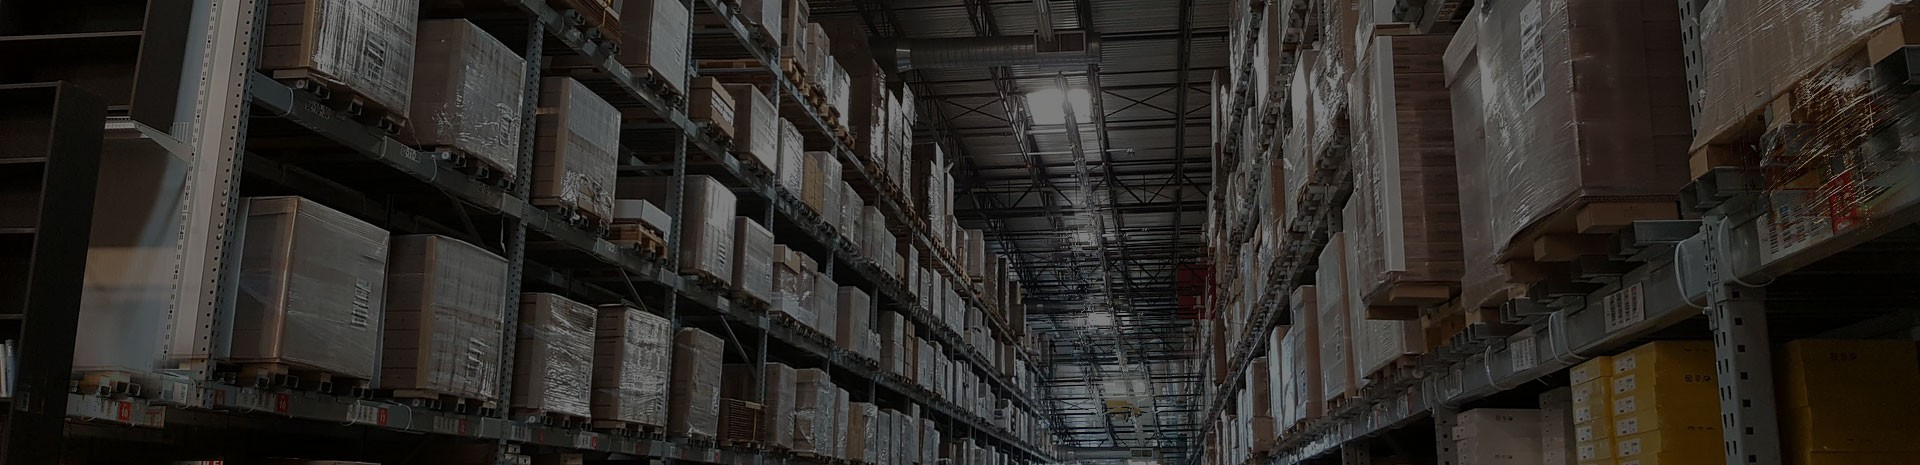 shop online materiale elettrico